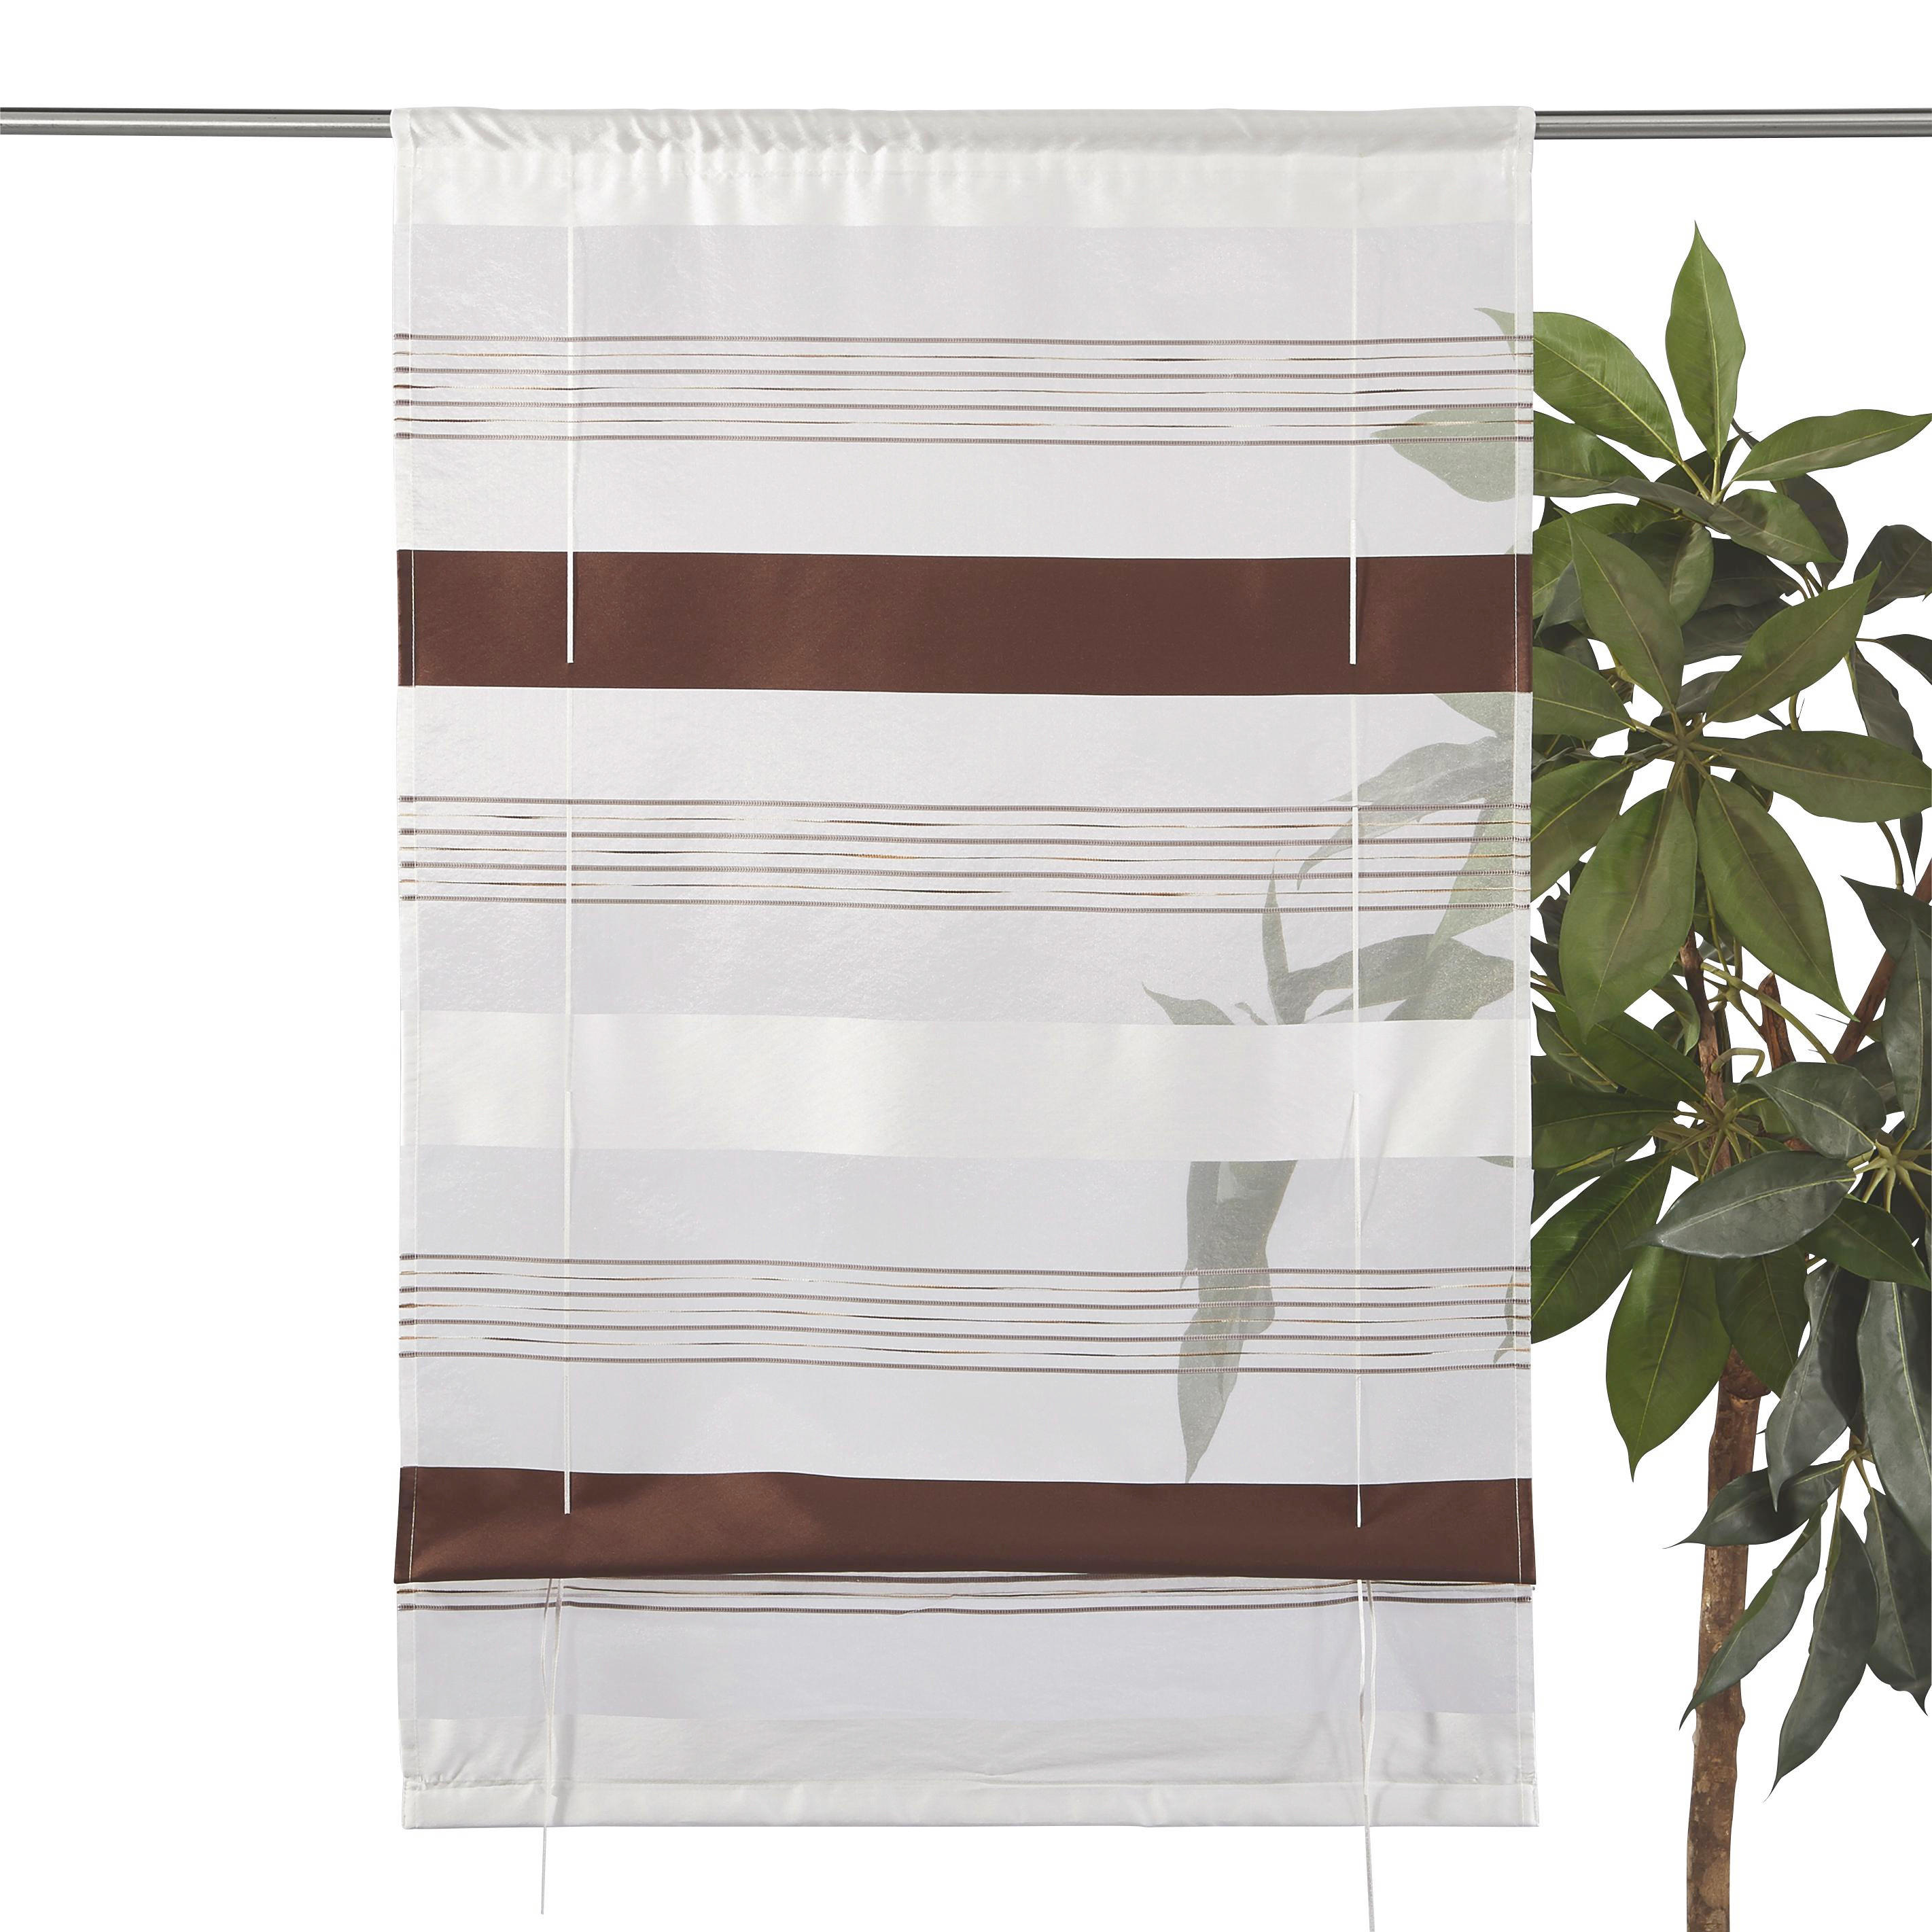 RAFFROLLO  halbtransparent   60/130 cm - Braun, Textil (60/130cm) - ESPOSA